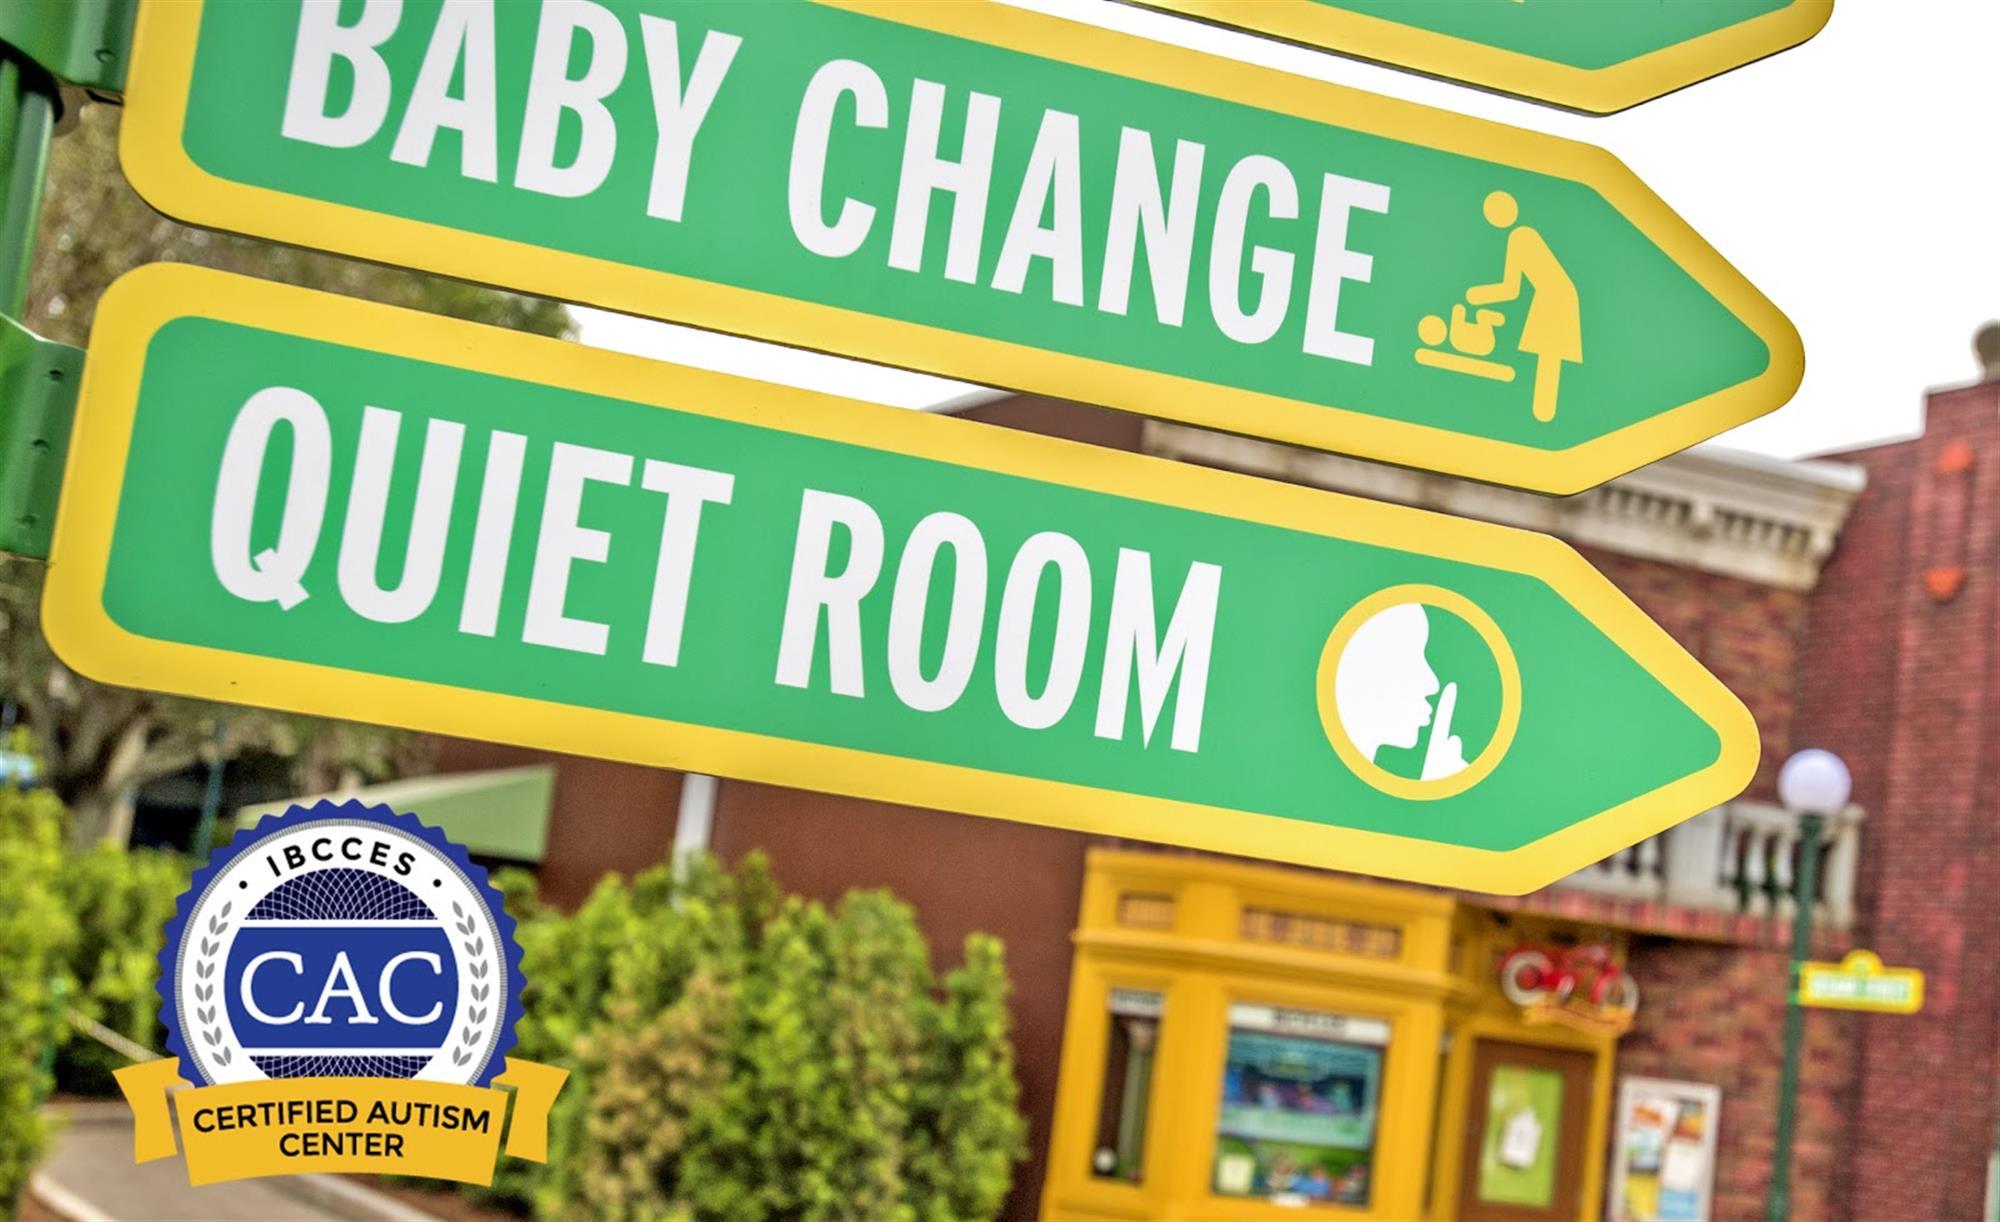 Seaworld Orlando Designated As A Certified Autism Center